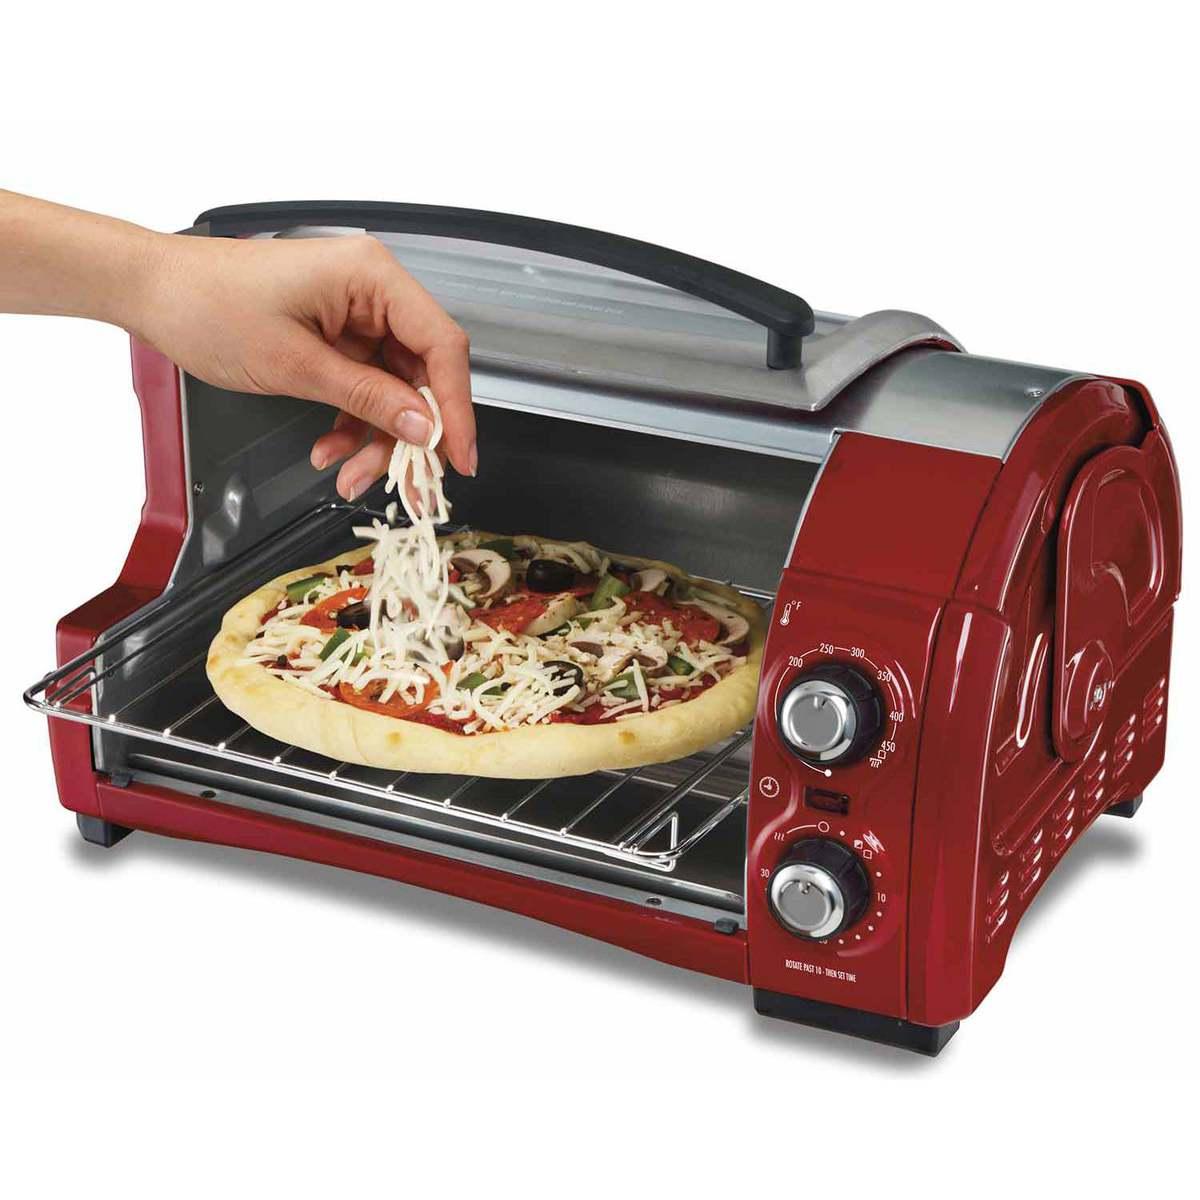 Hamilton Beach Easy Reach 4 Slice Toaster Oven 31337